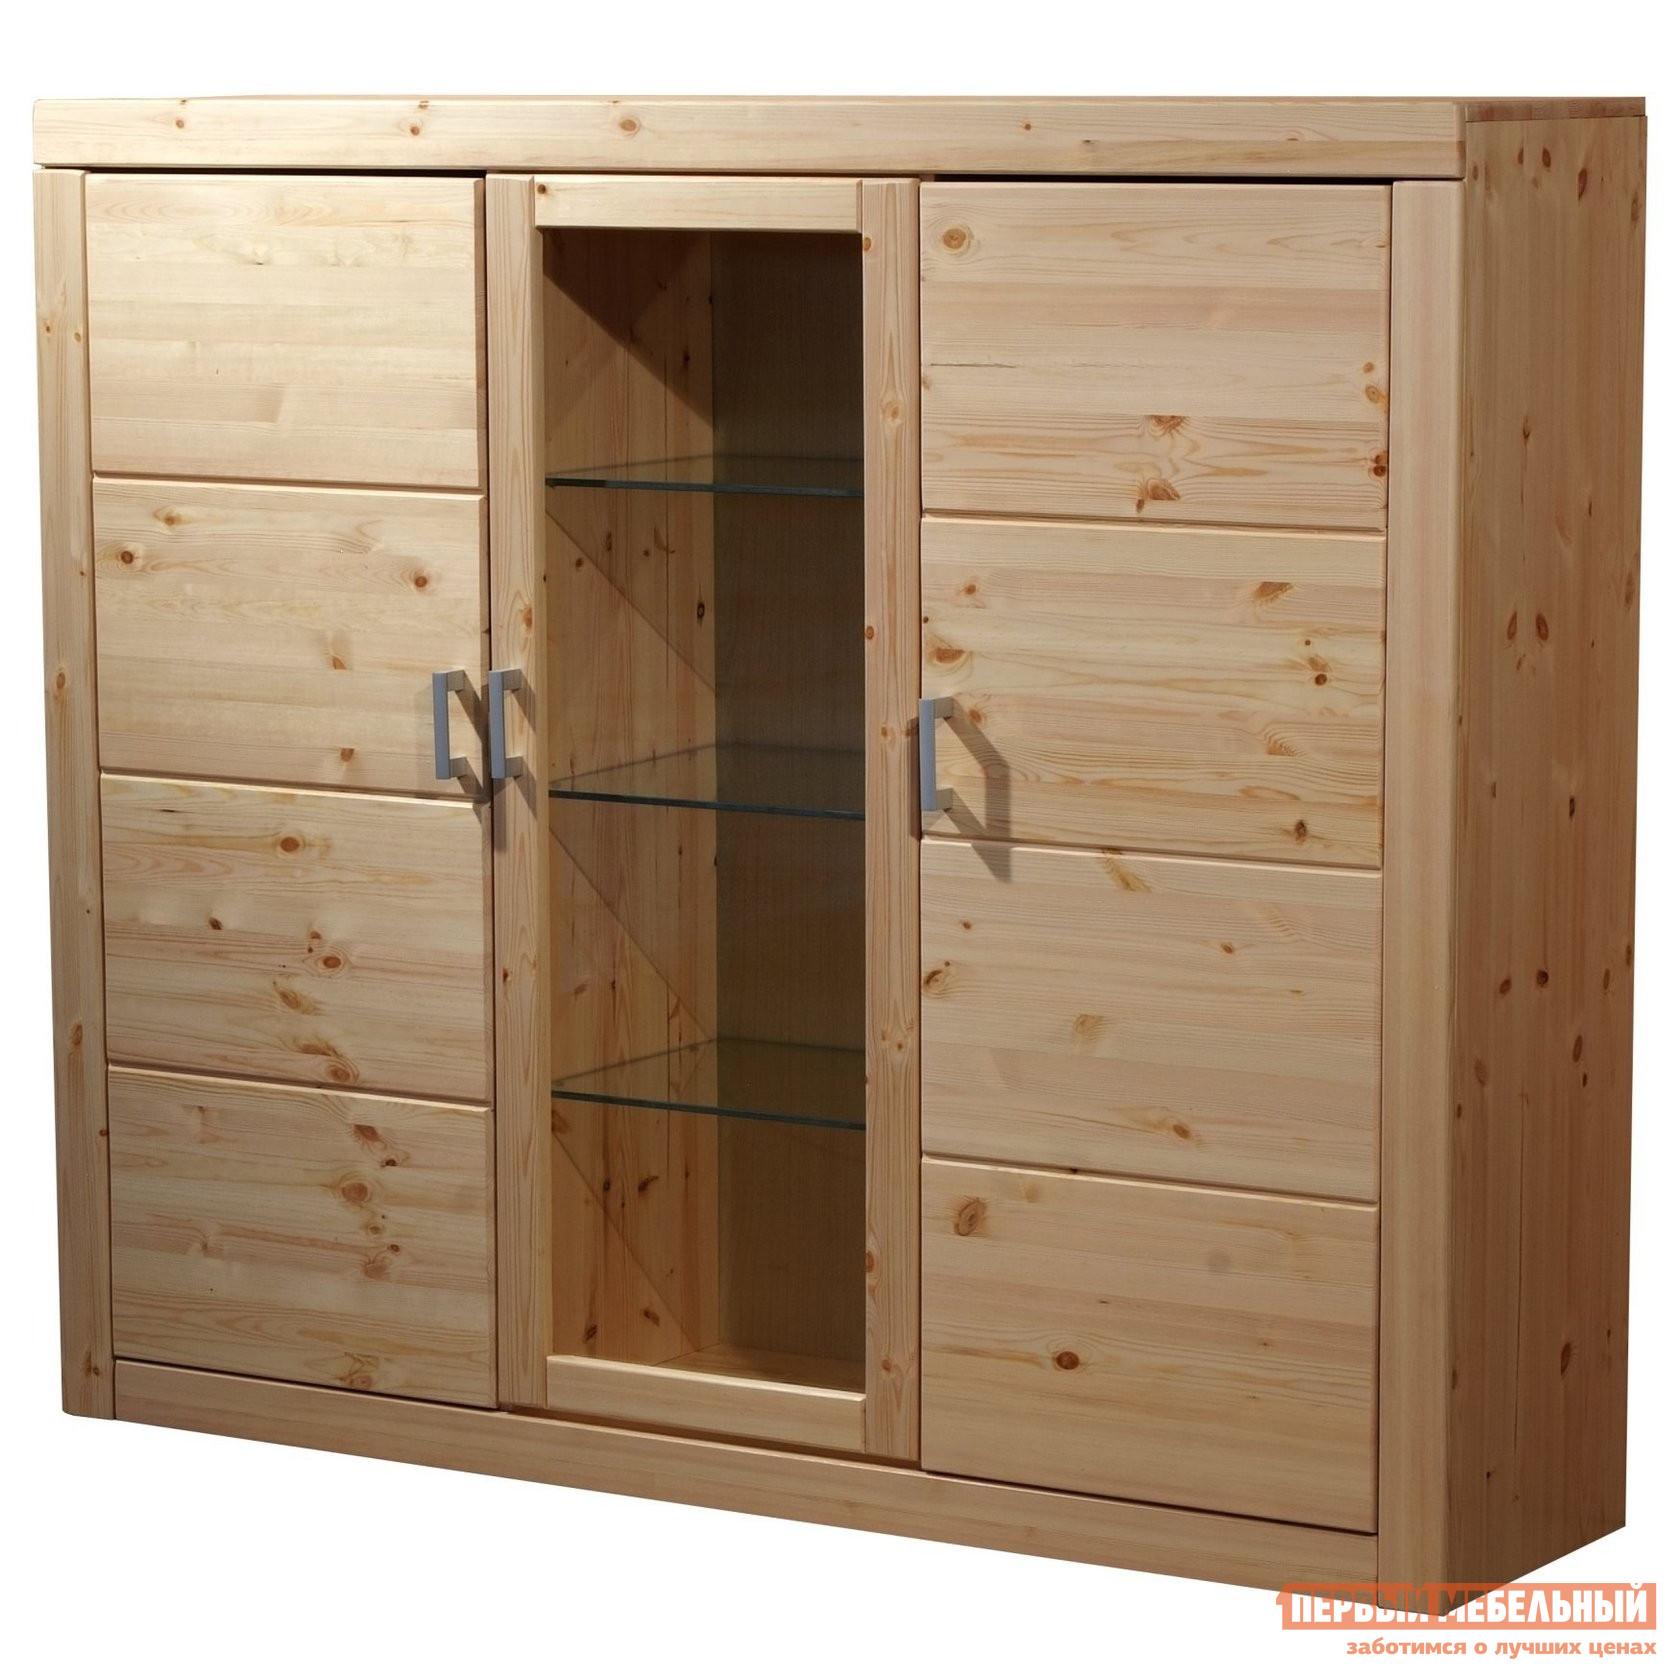 Шкаф-витрина Timberica Буфет 3-створчатый Брамминг шкаф витрина timberica шкаф книжный айно 2